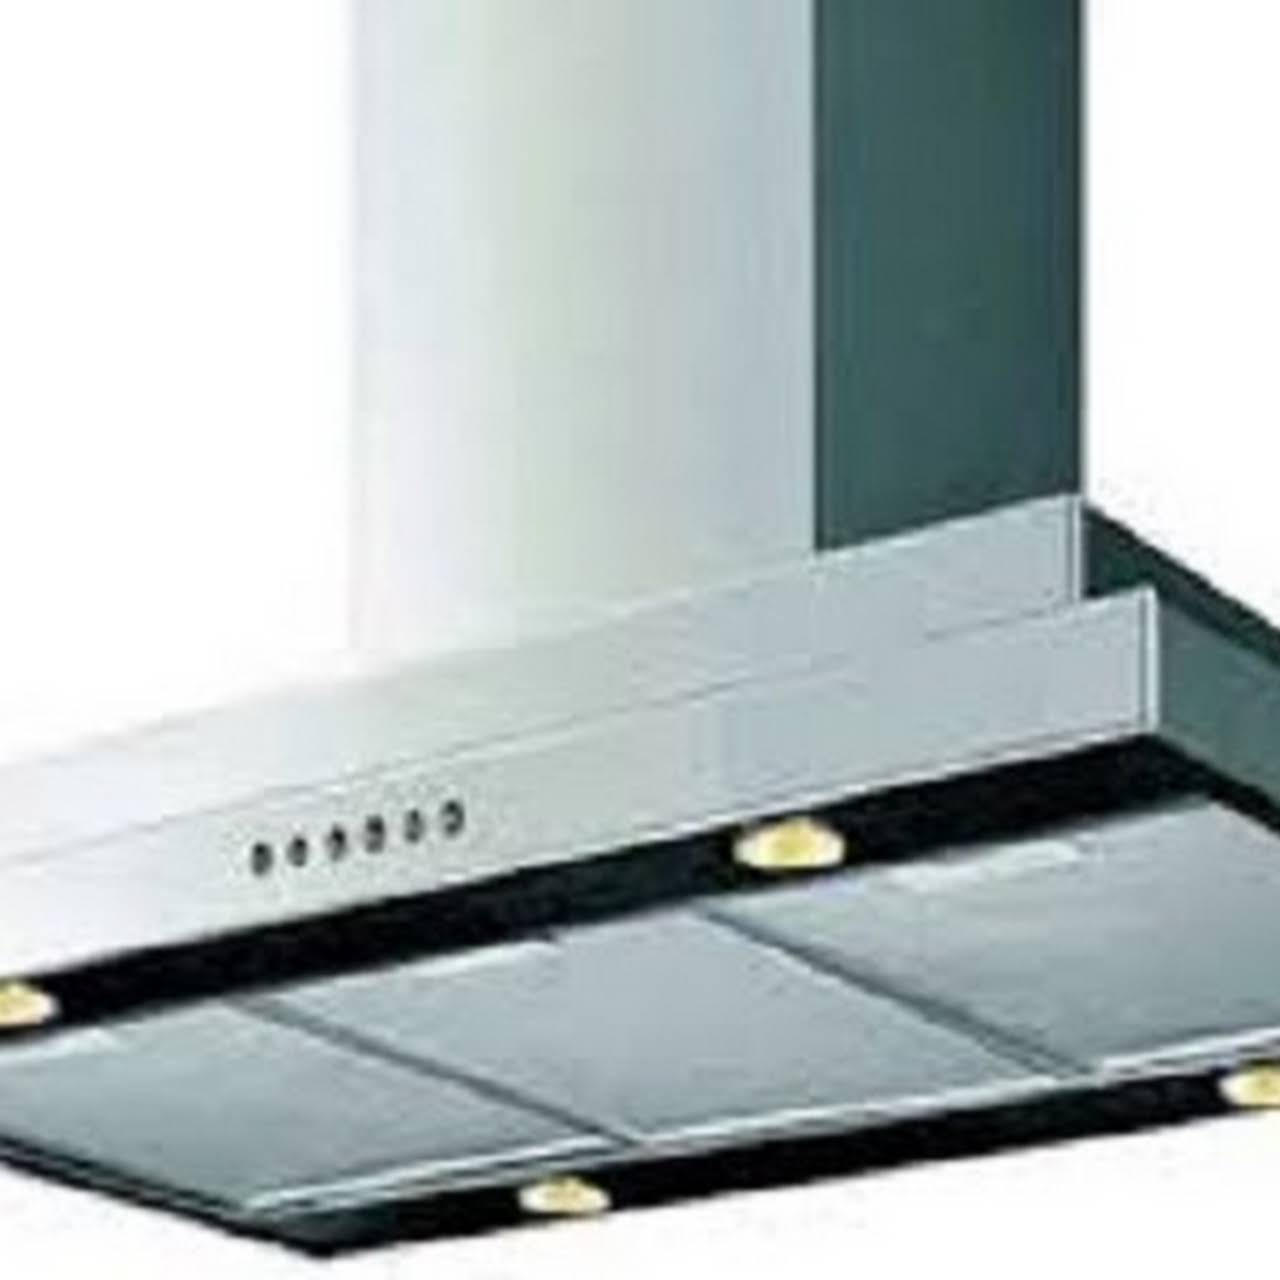 Kitchen Chimney repair Sevice Noida - Chimney Sweep in Noida